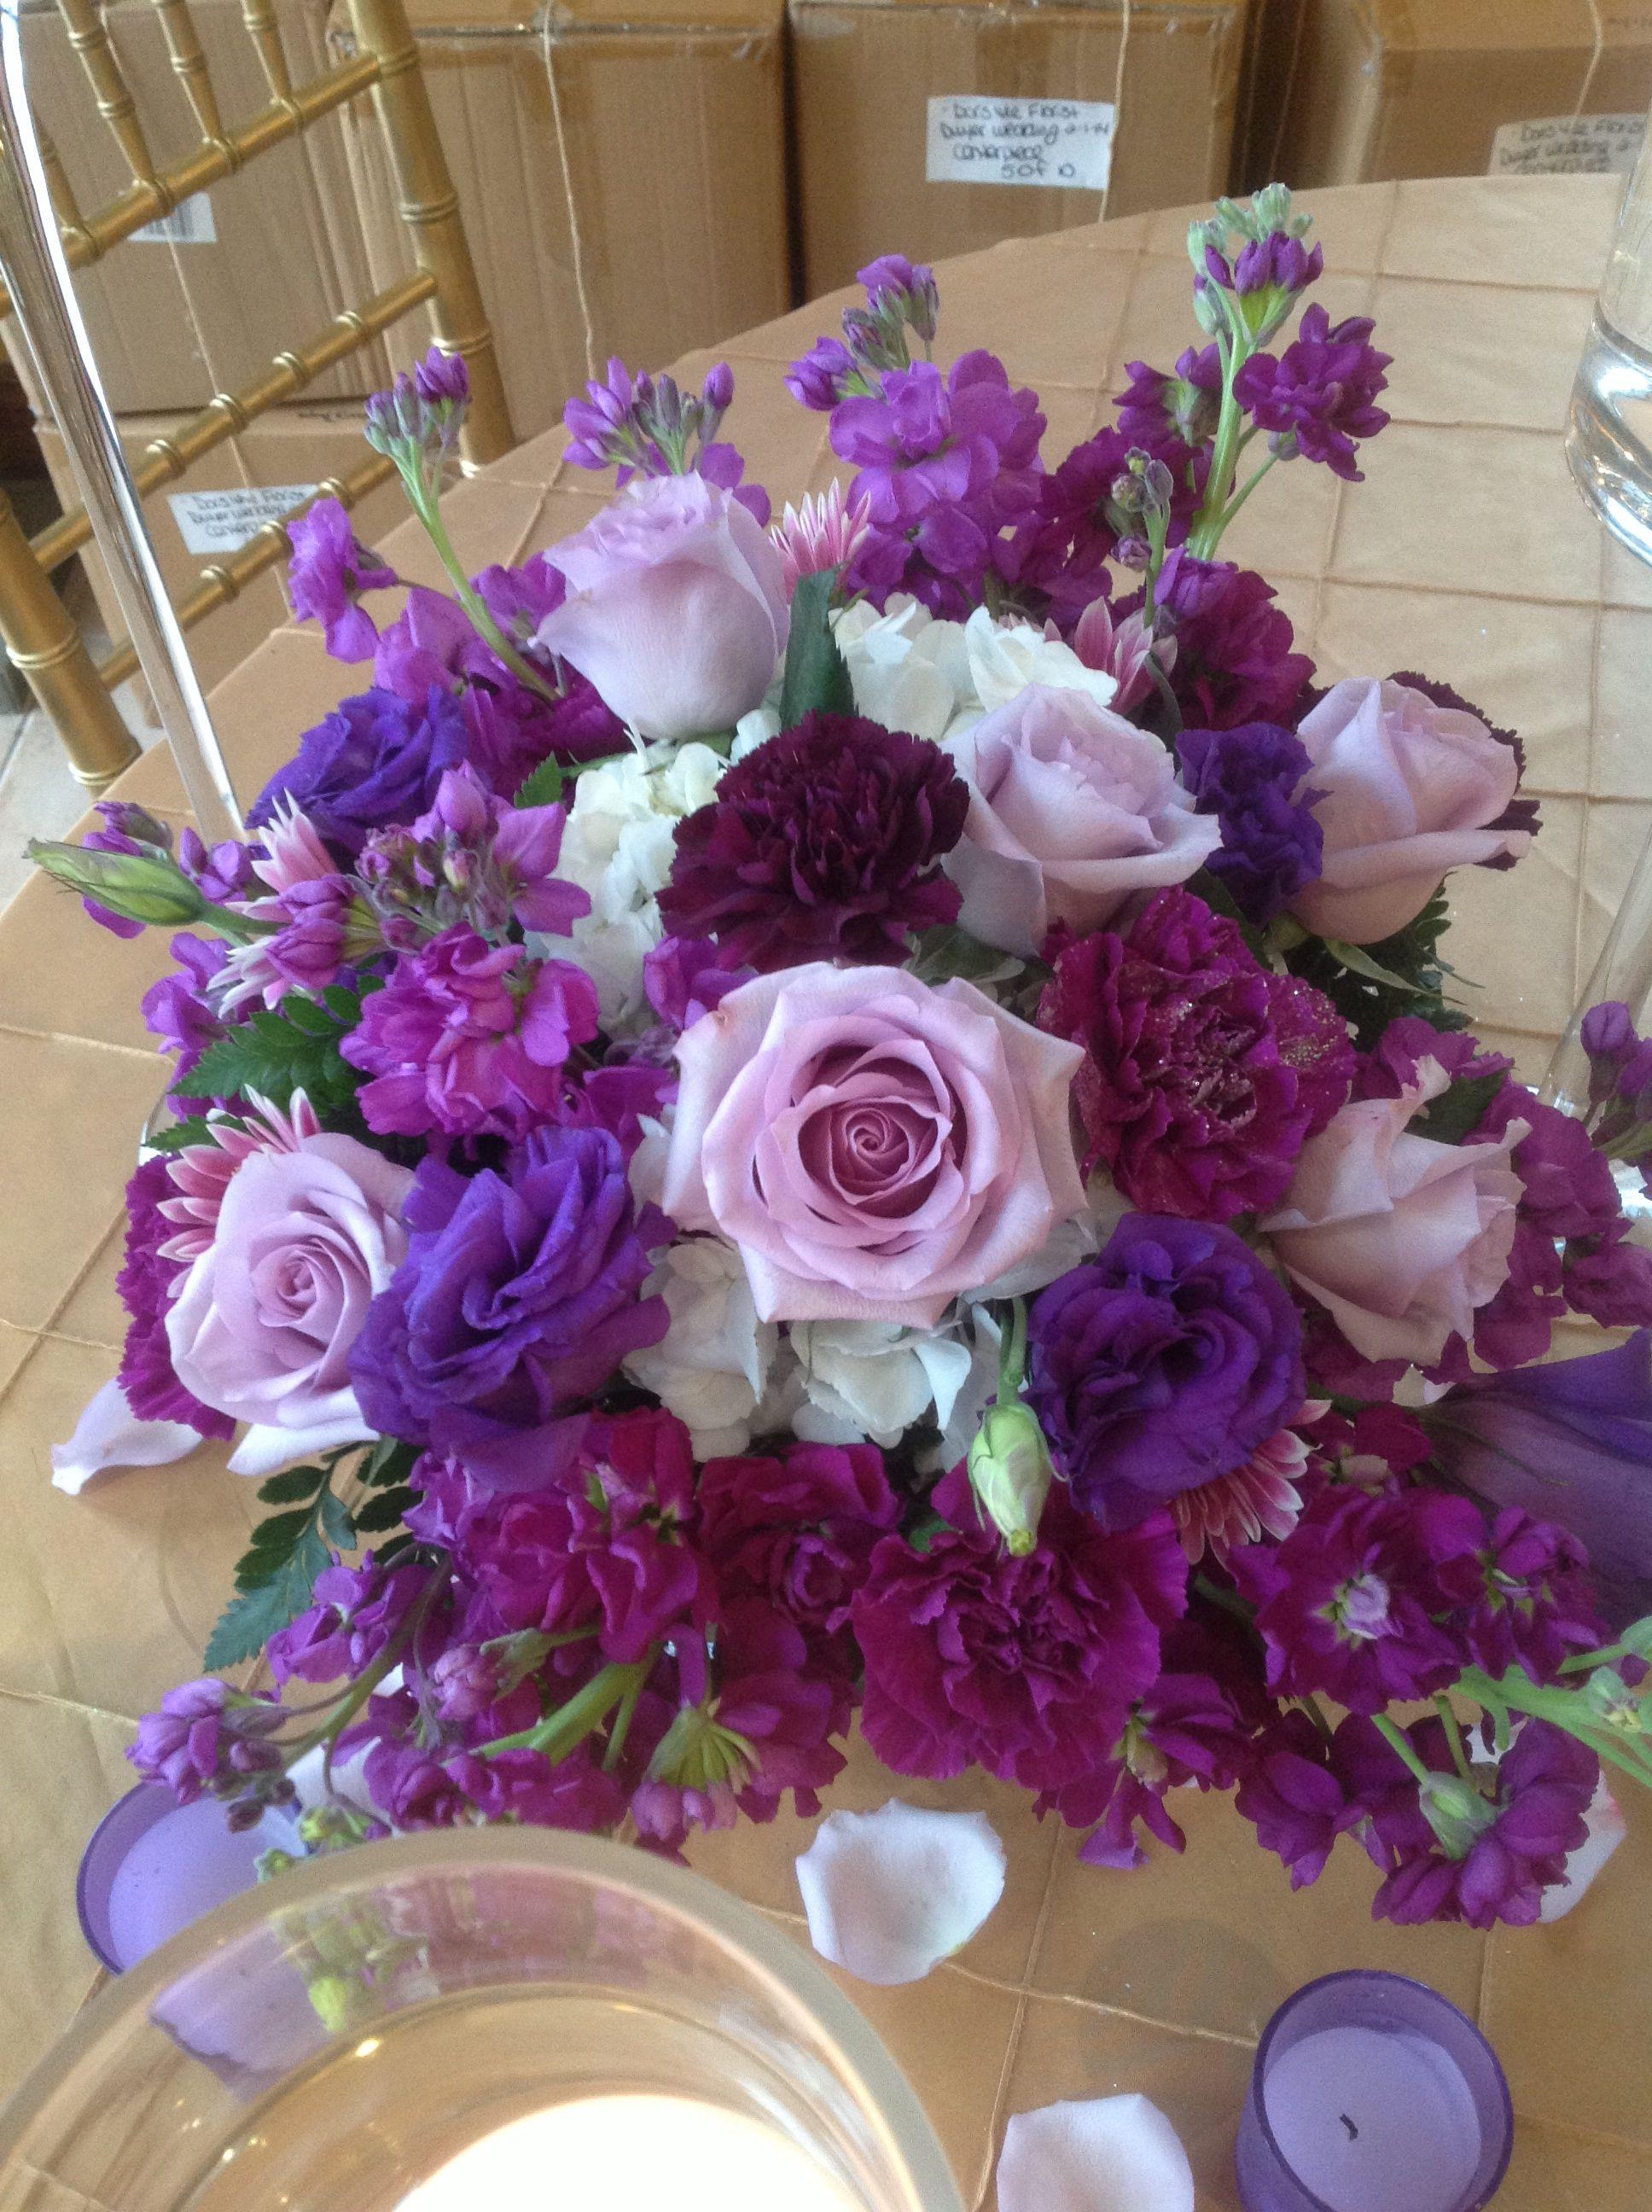 Wedding Centerpiece Of Lavender Roses Caspia Lavender Stock Lavender Daisy Purple Lisianth Pink Wedding Flowers Wedding Centerpieces Wedding Colors Purple